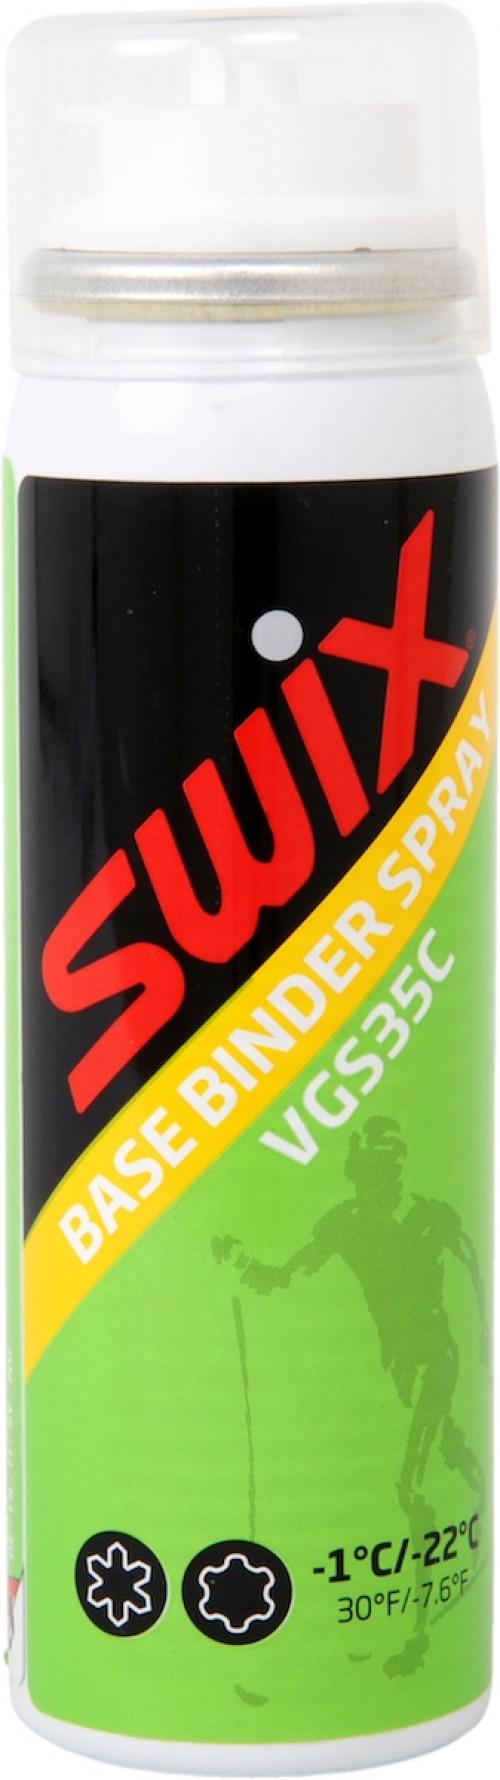 Swix VGS35C Base Binder Spray, 70 Ml